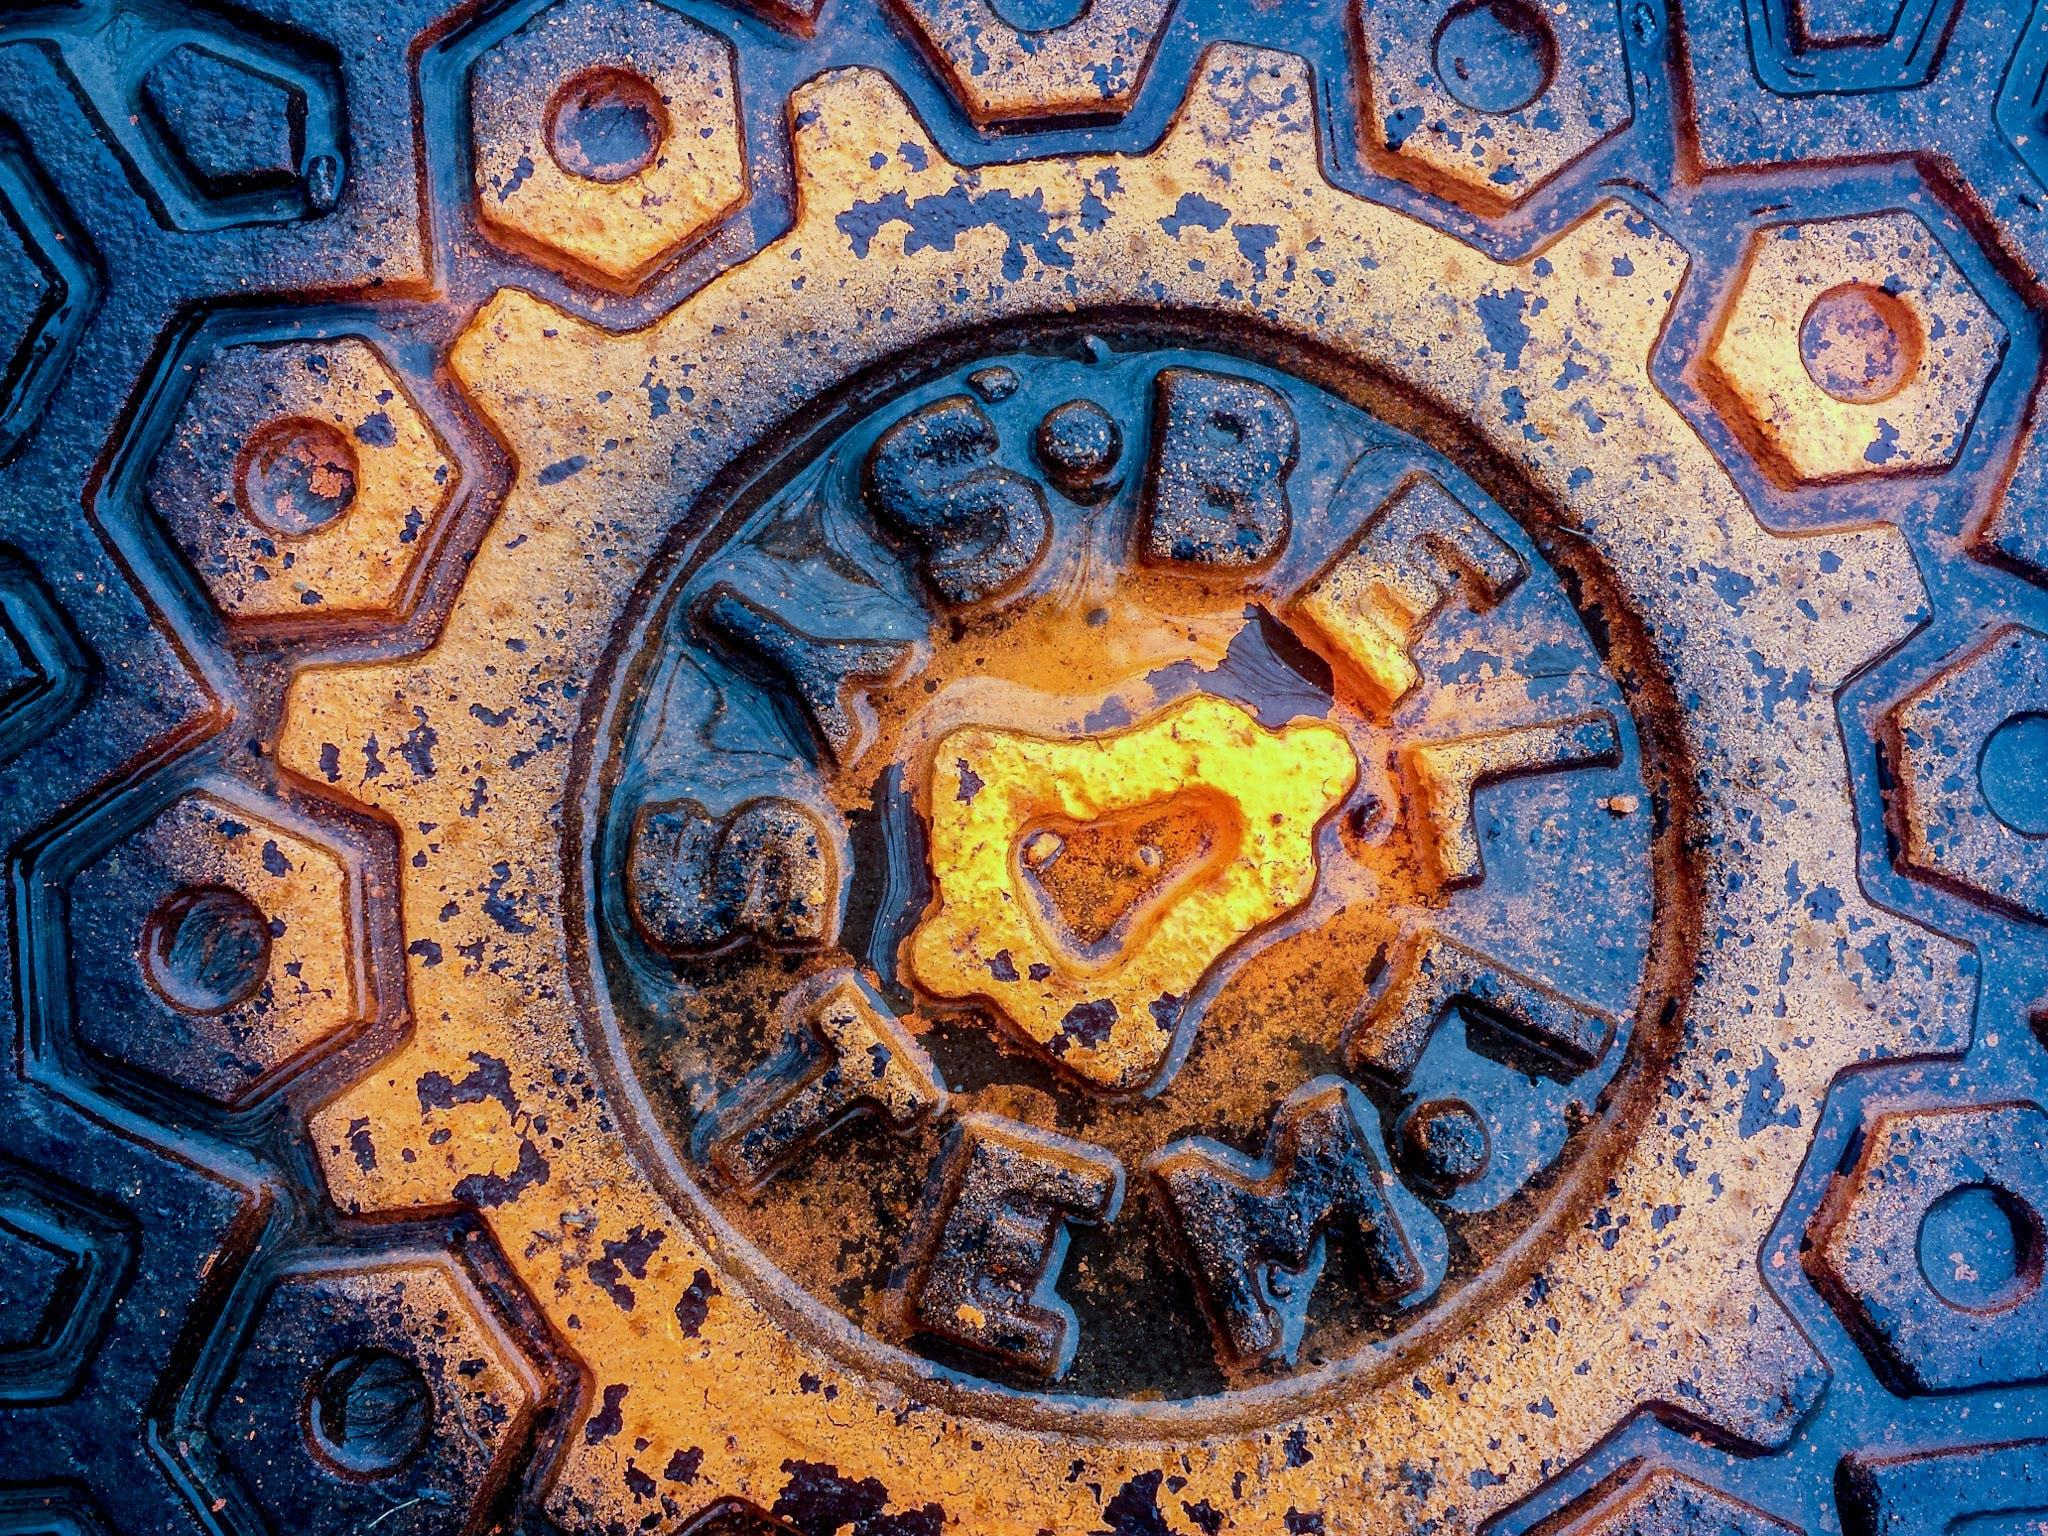 Free stock photo of color, geometric shapes, iron, manhole cover